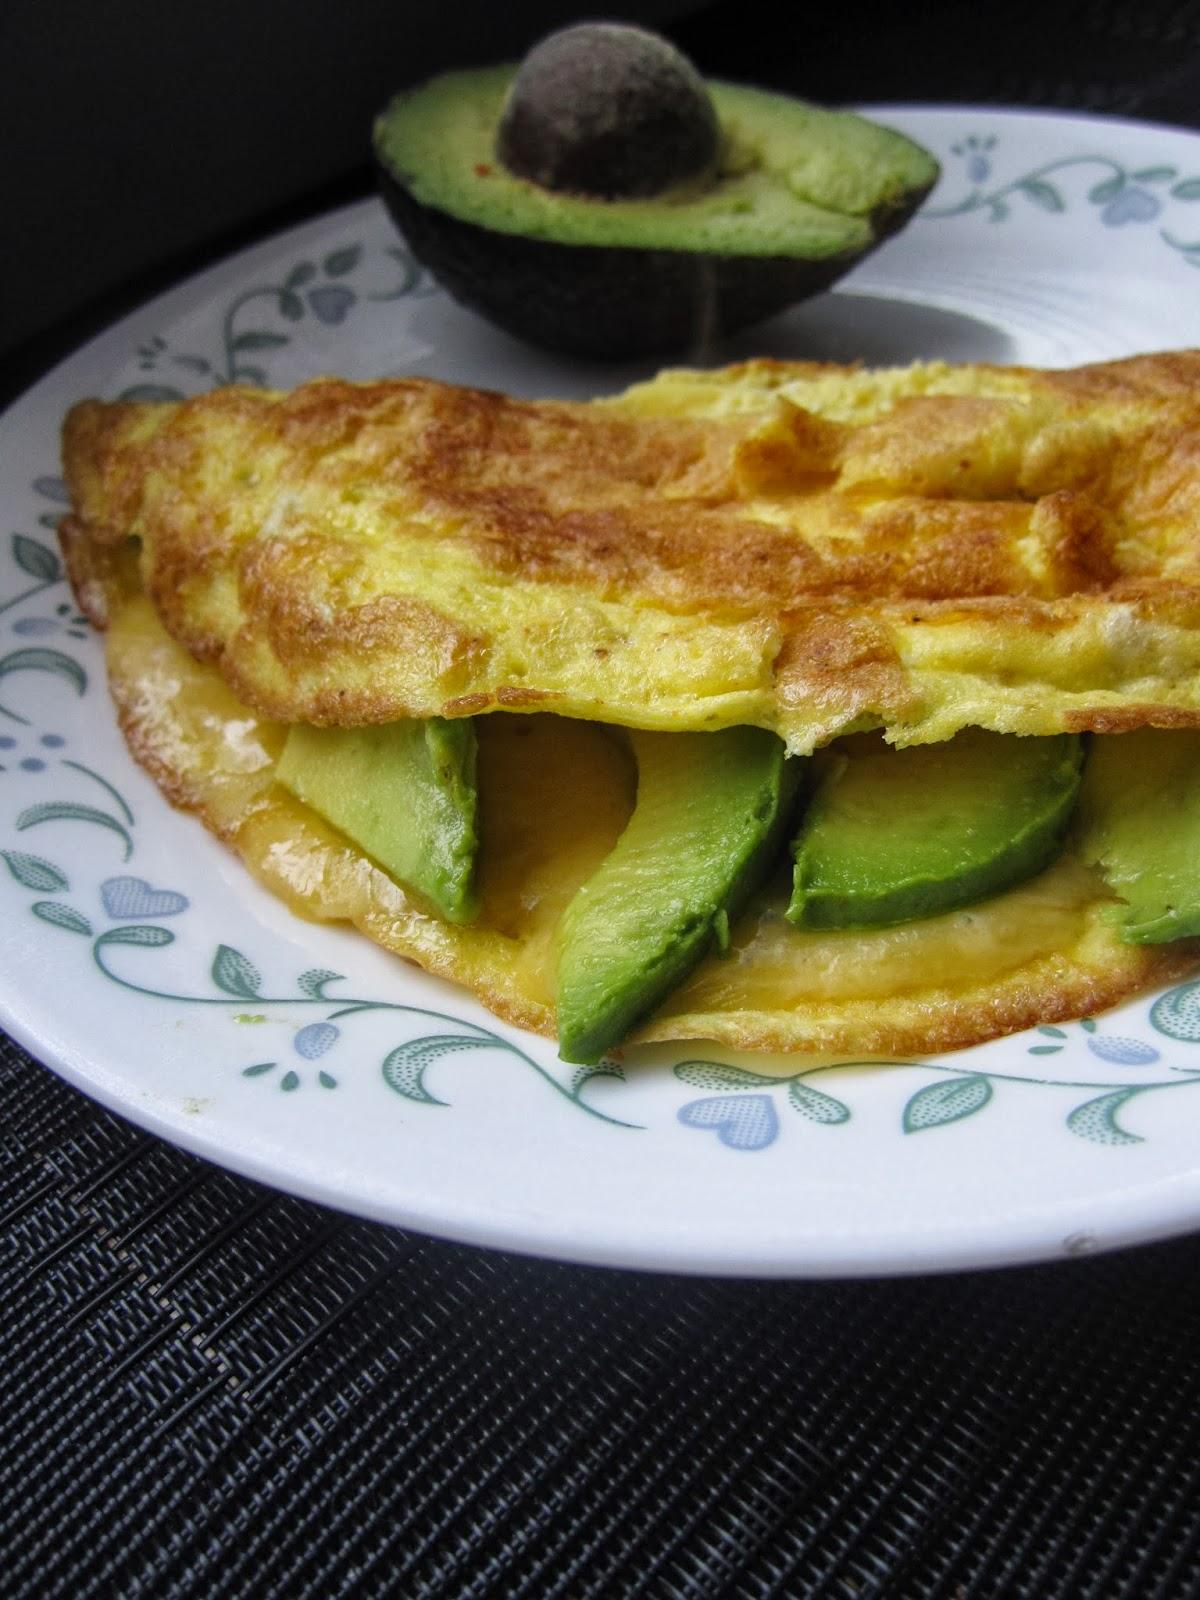 Avocado and Havarti Omelette